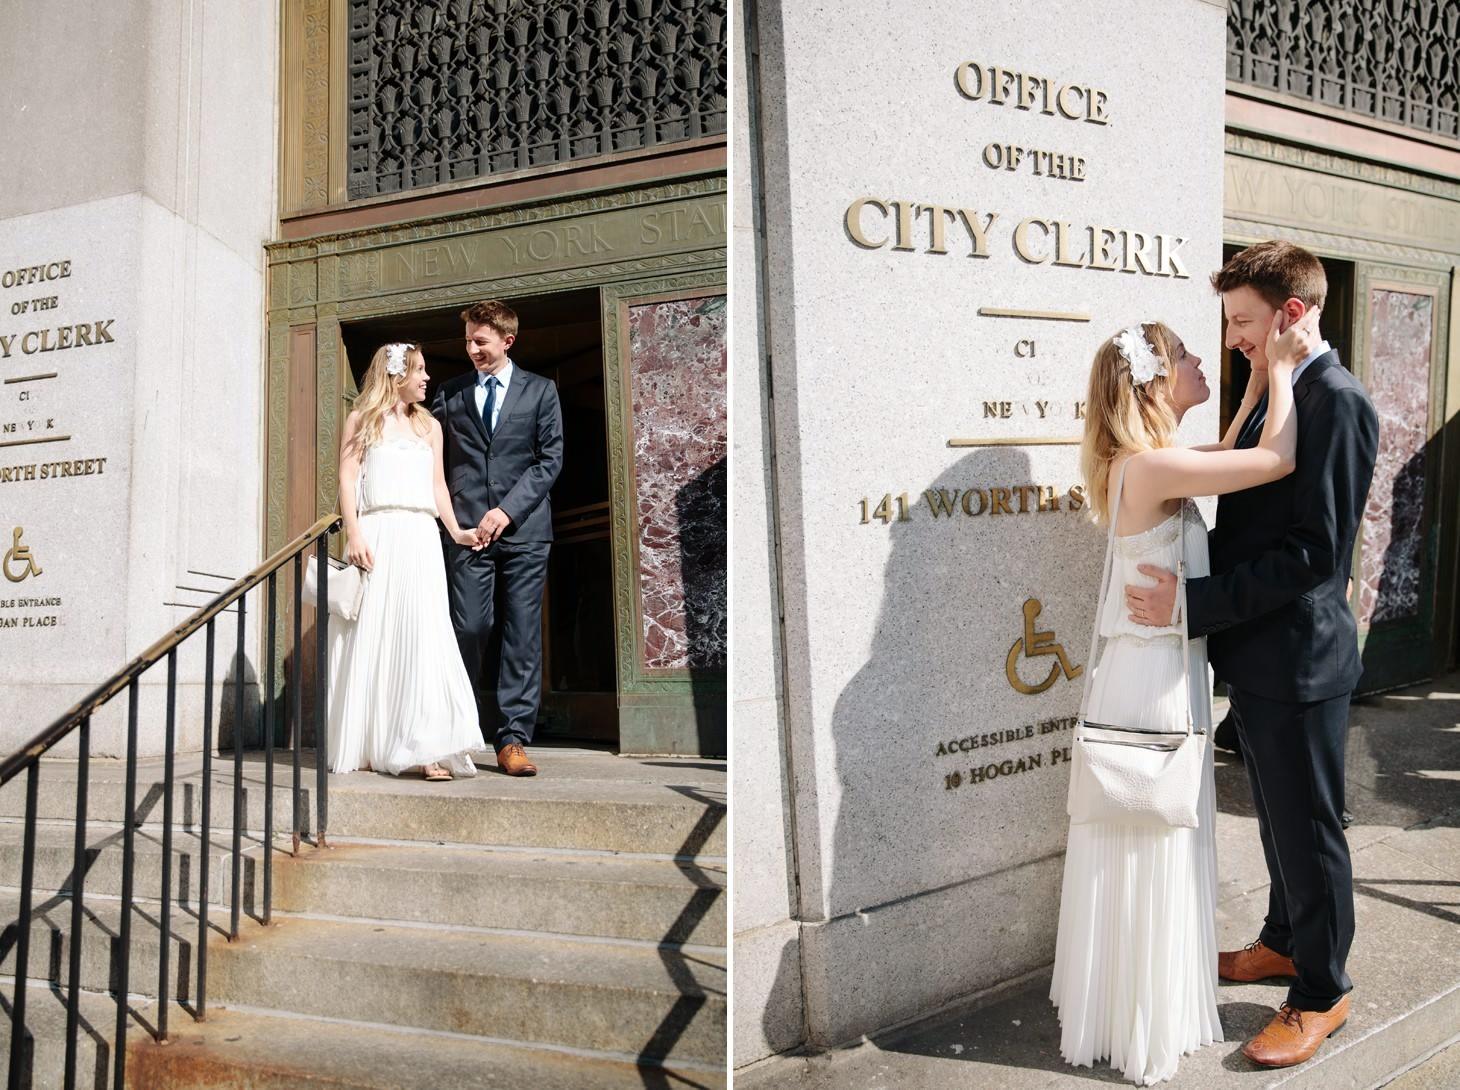 nyc-wedding-photographer-brooklyn-bridge-smitten-chickens-photo025.jpg